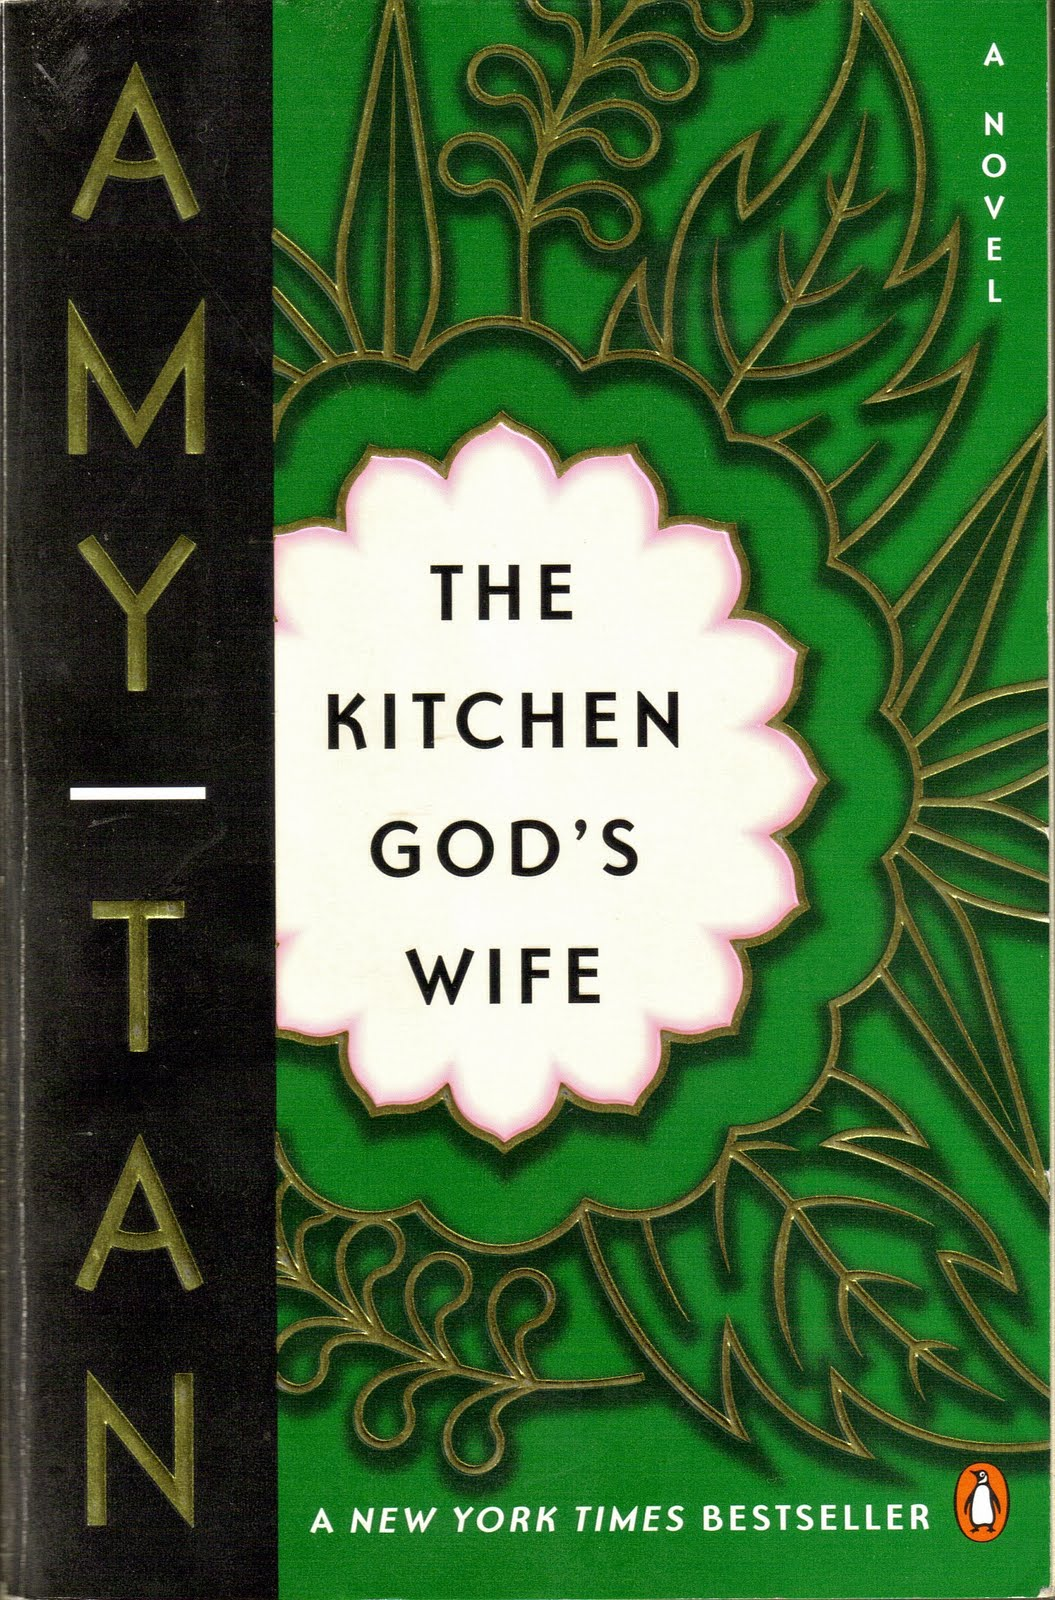 amy tan kitchen god's wife